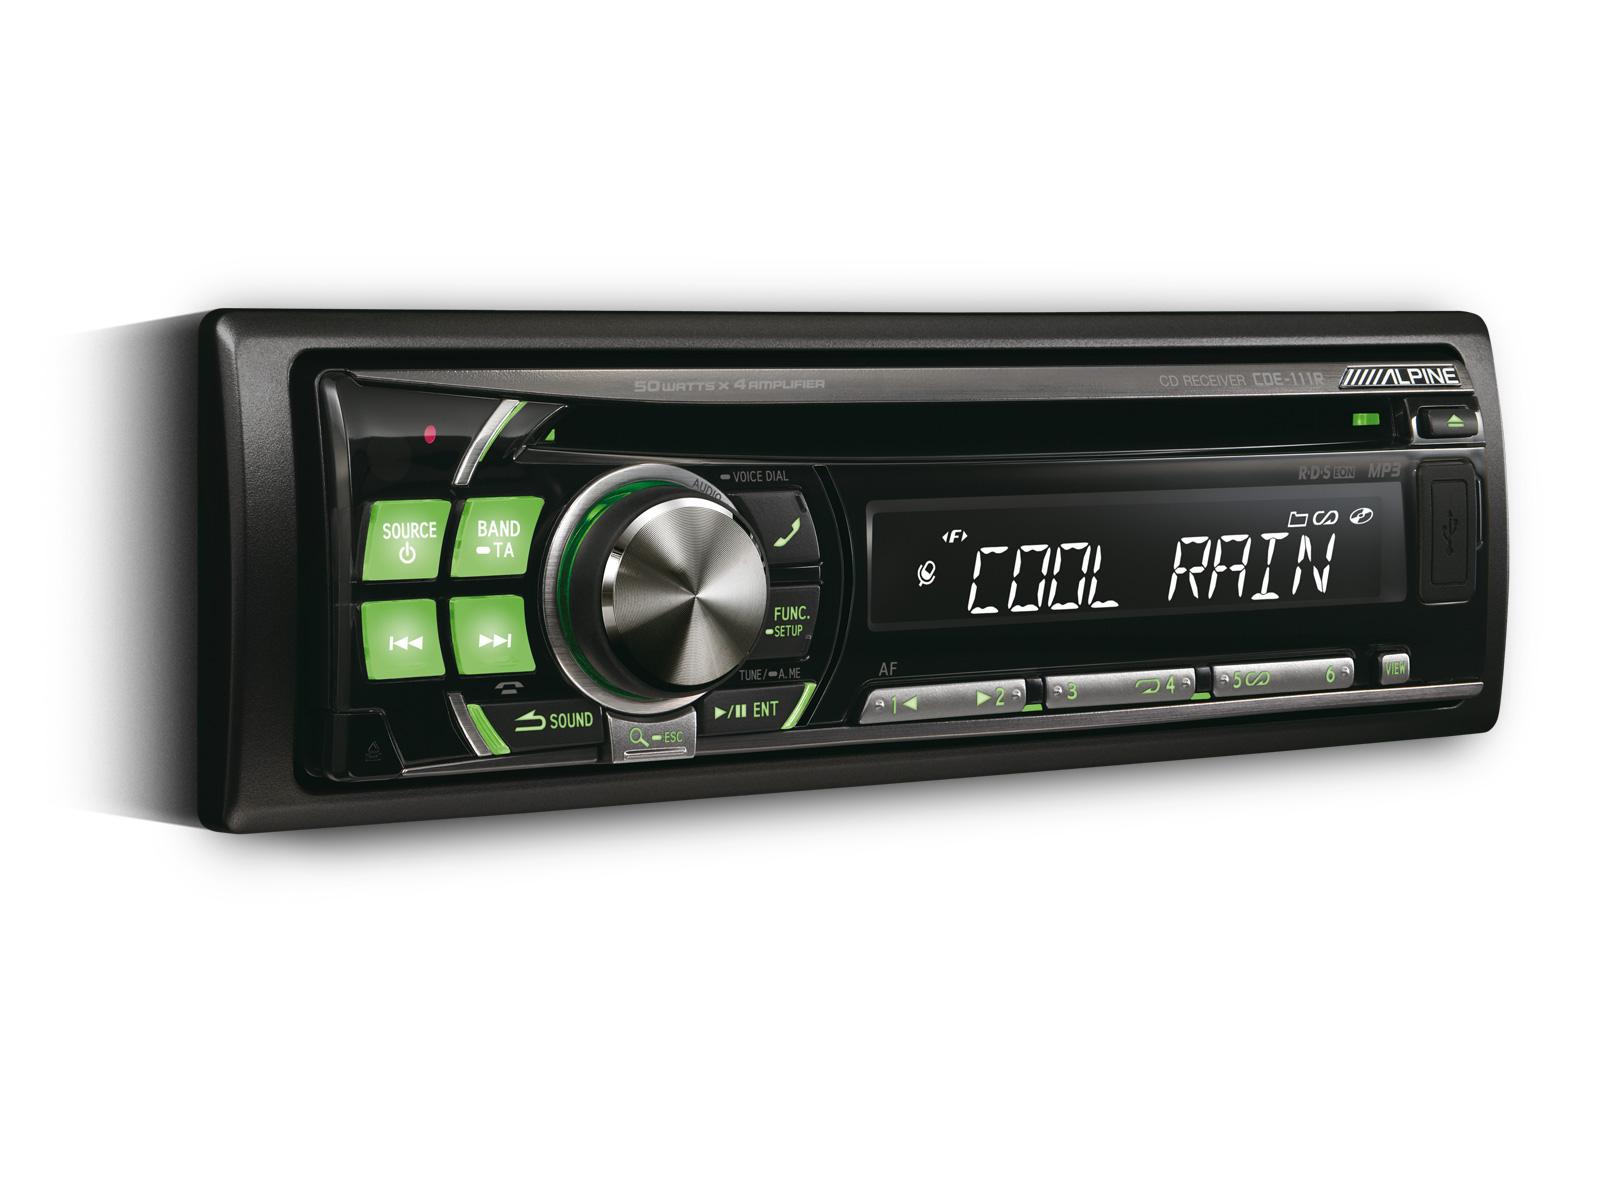 Reglage autoradio alpine cde-111r